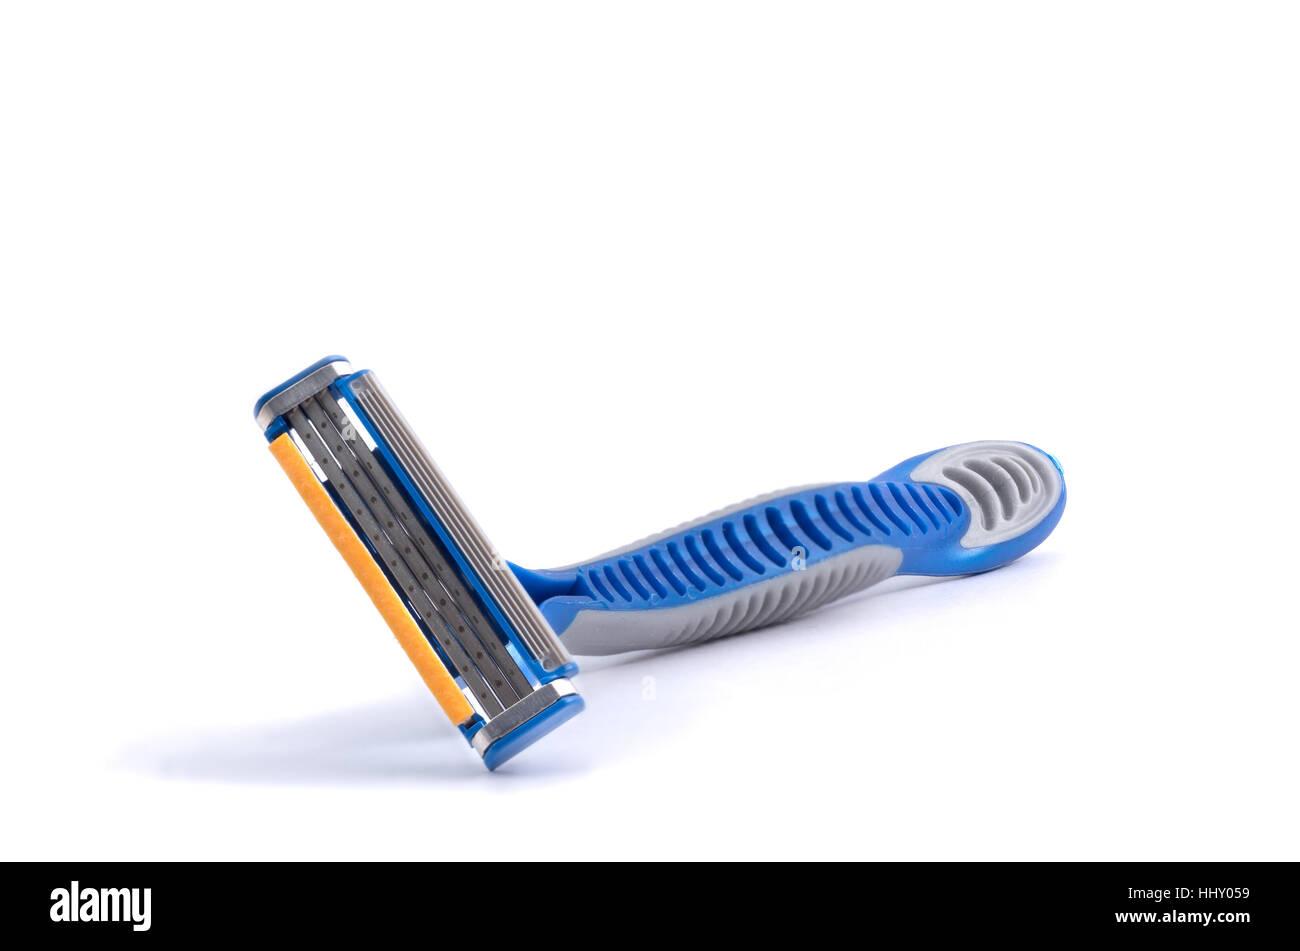 shaving razor tri blade isolated on a white background - Stock Image